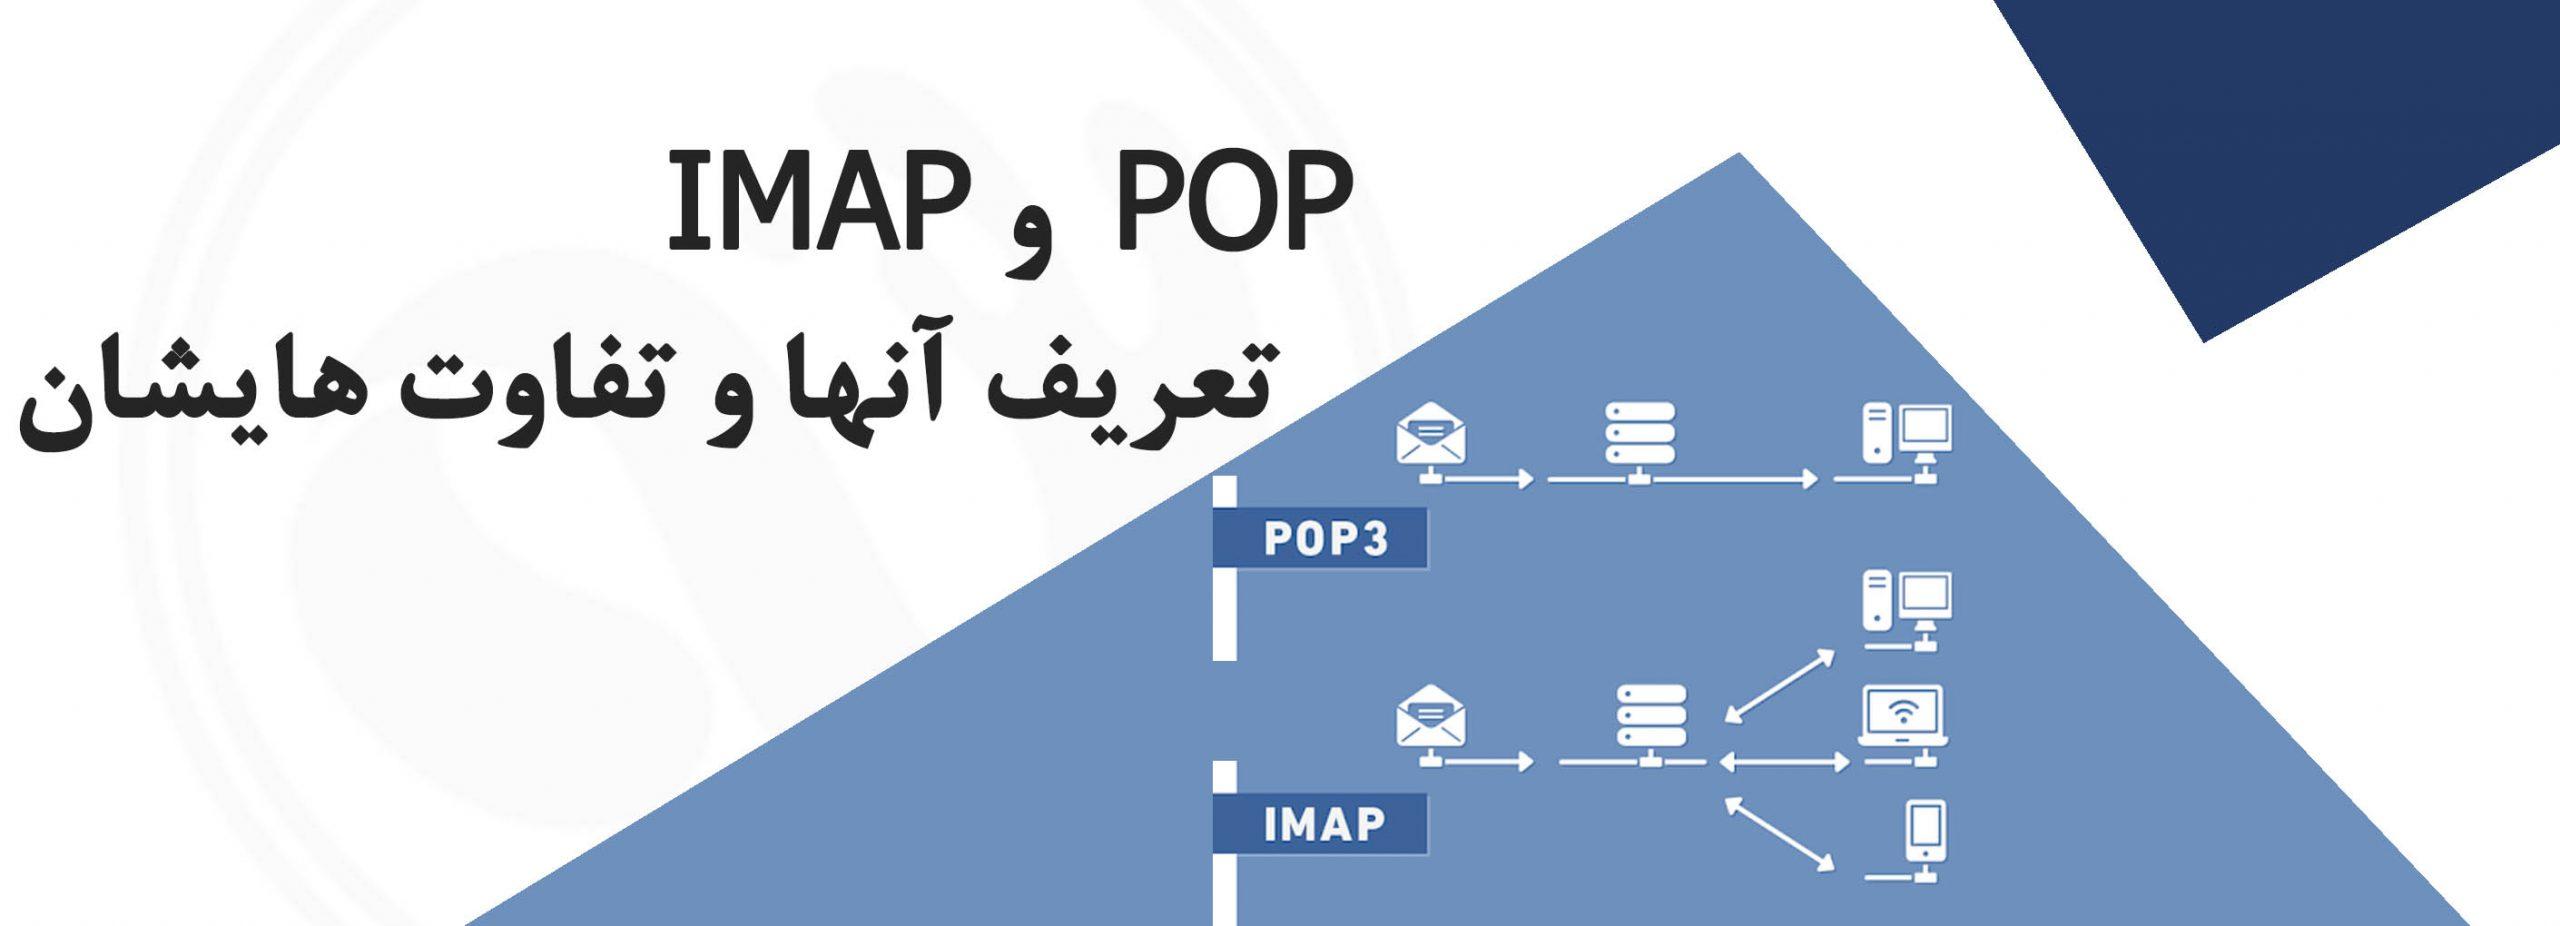 POP و IMAP | تعریف آنها و تفاوت هایشان